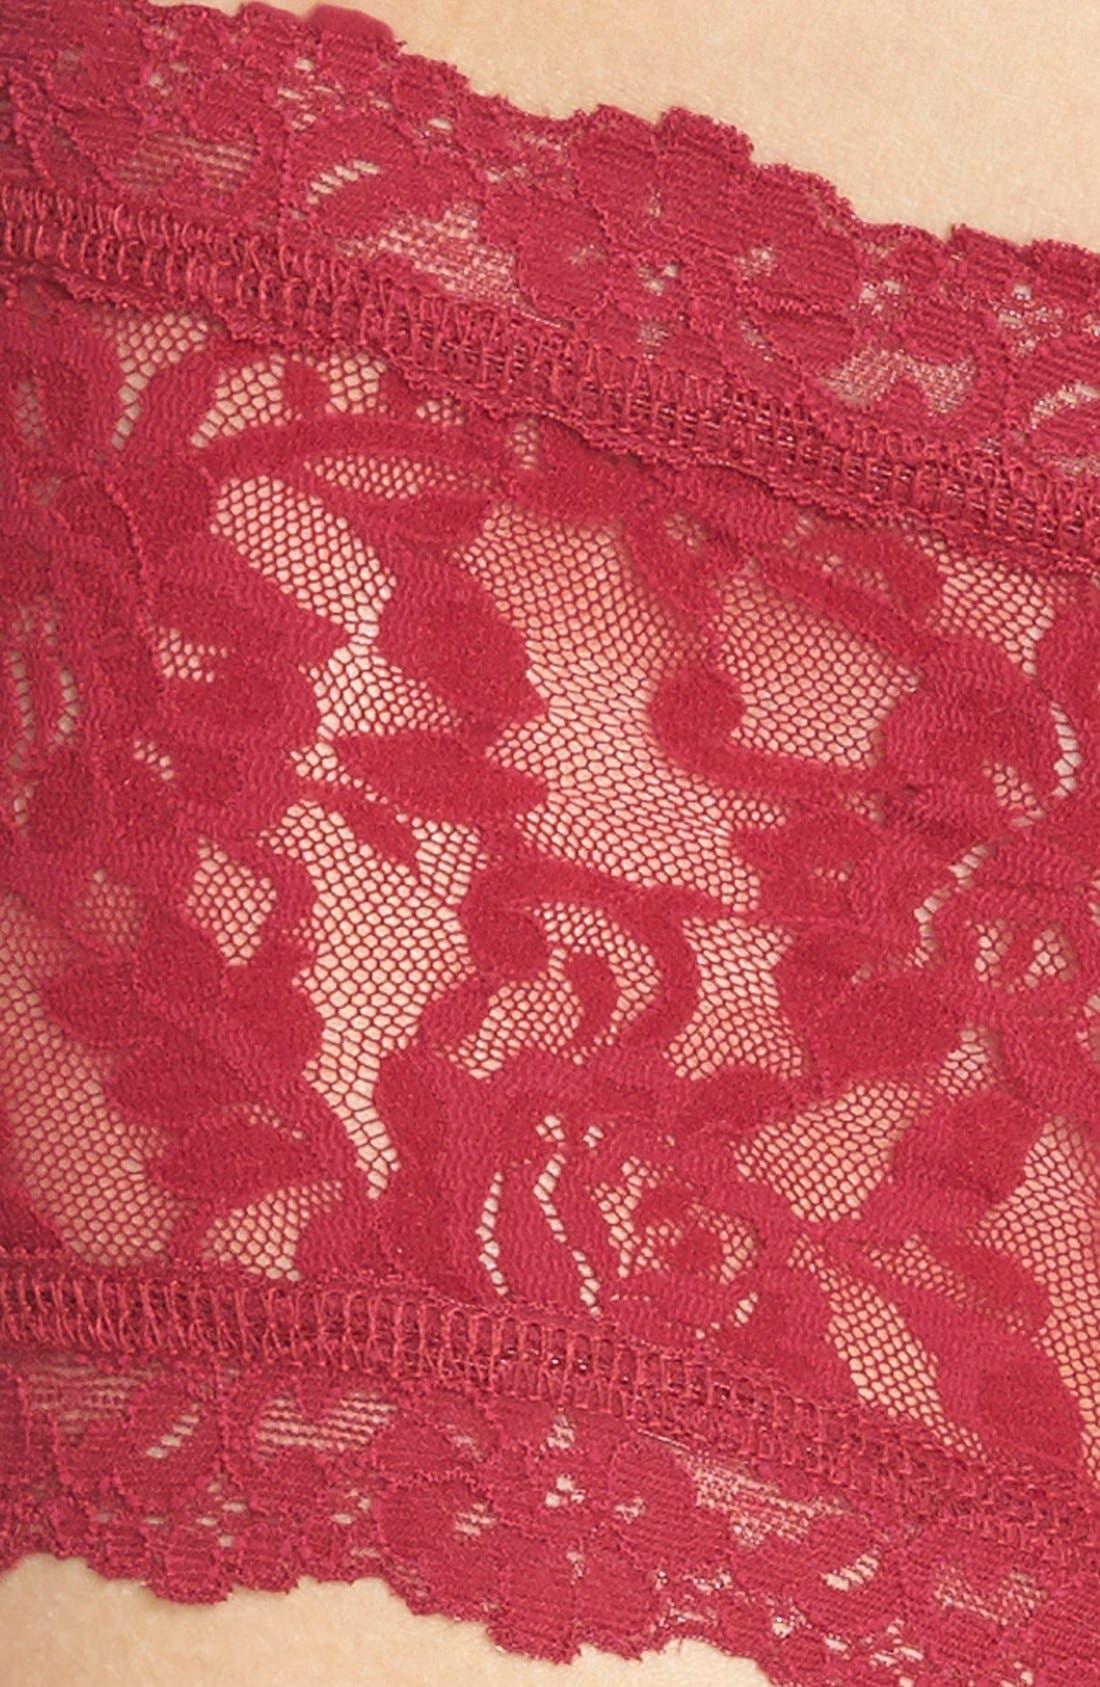 'Signature Lace' Boyshorts,                             Alternate thumbnail 233, color,